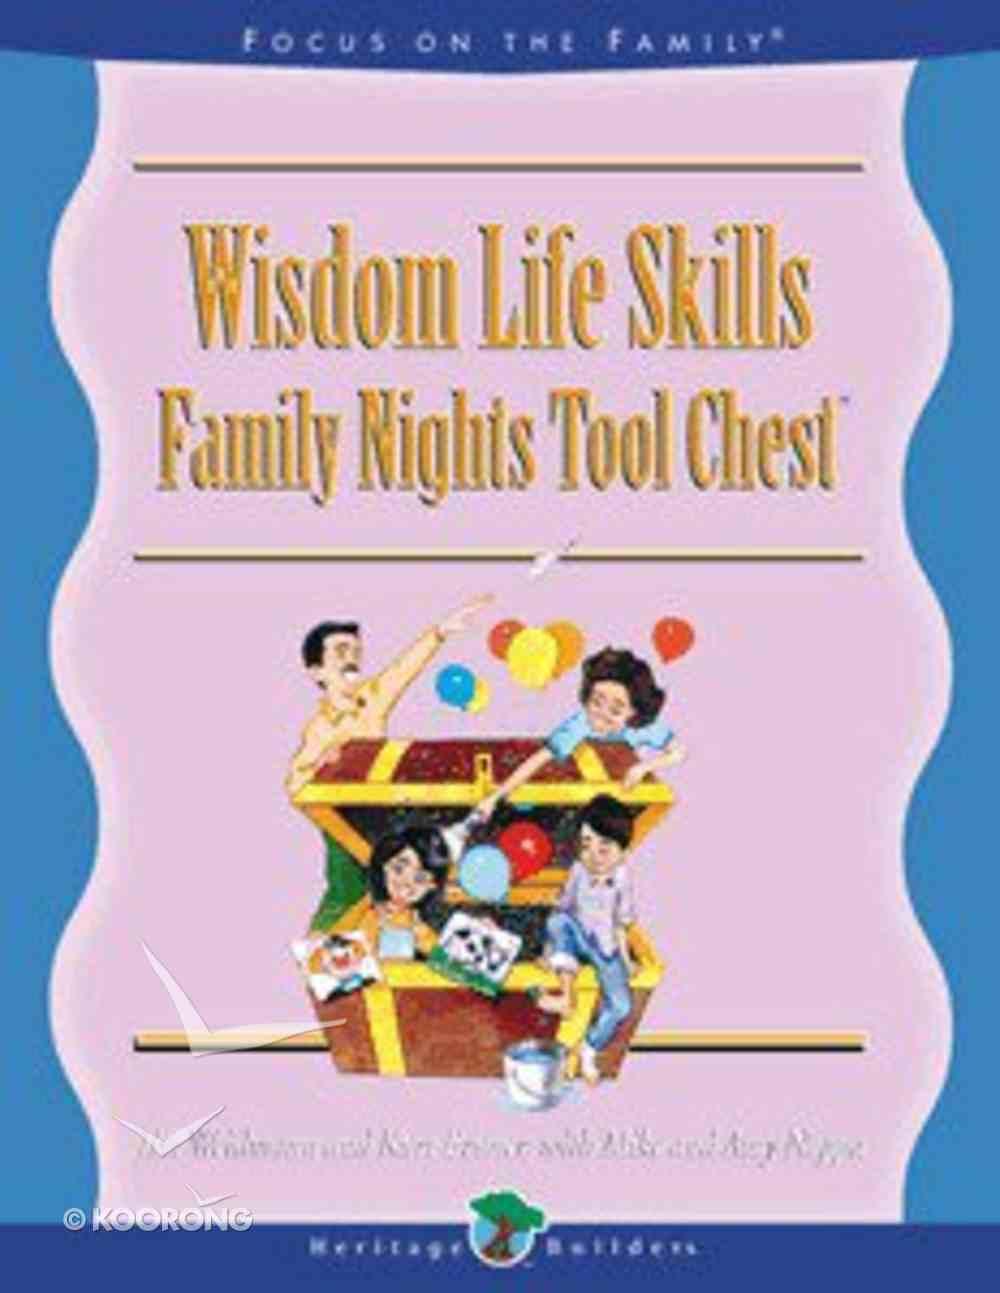 Family Nights: Wisdom Life Skills Paperback